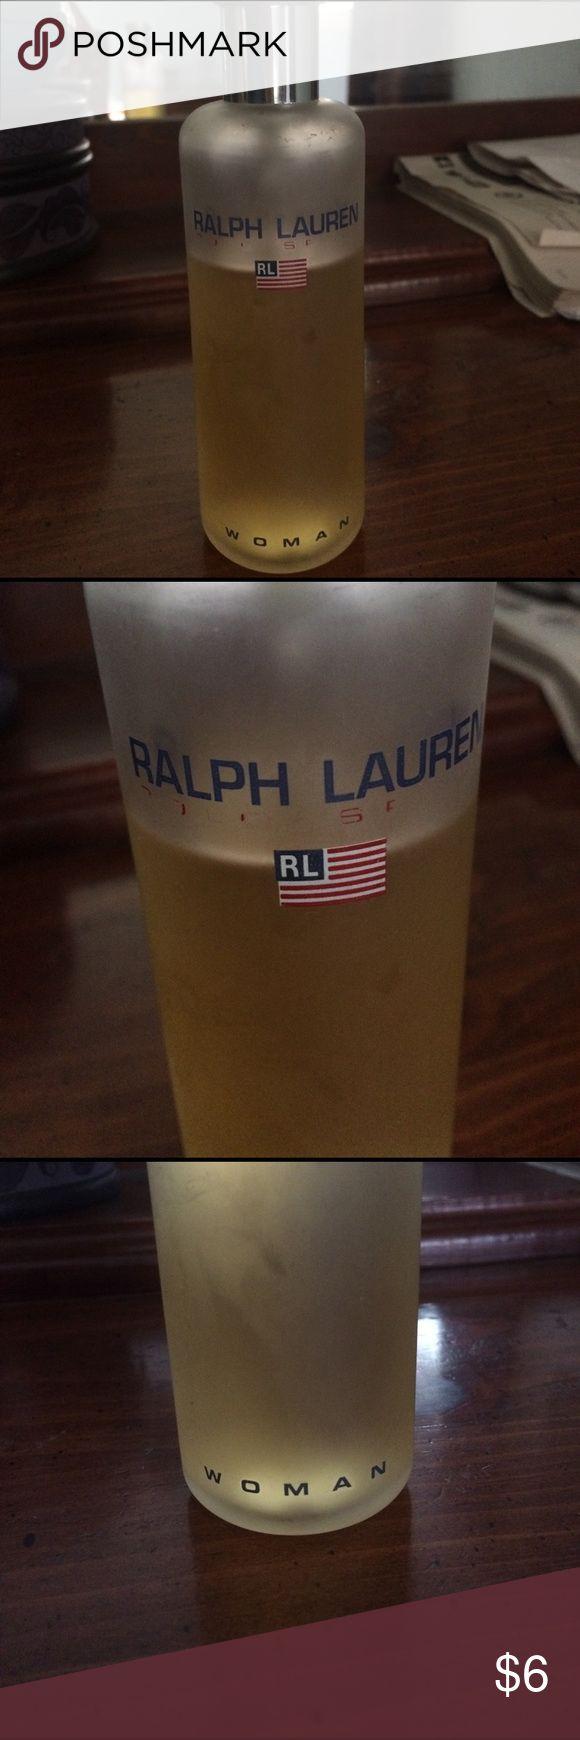 Ralph Lauren perfume Polo Sport womans perfume, 5.1oz , this bottle is alittle more than 3/4 full. Ralph Lauren Accessories